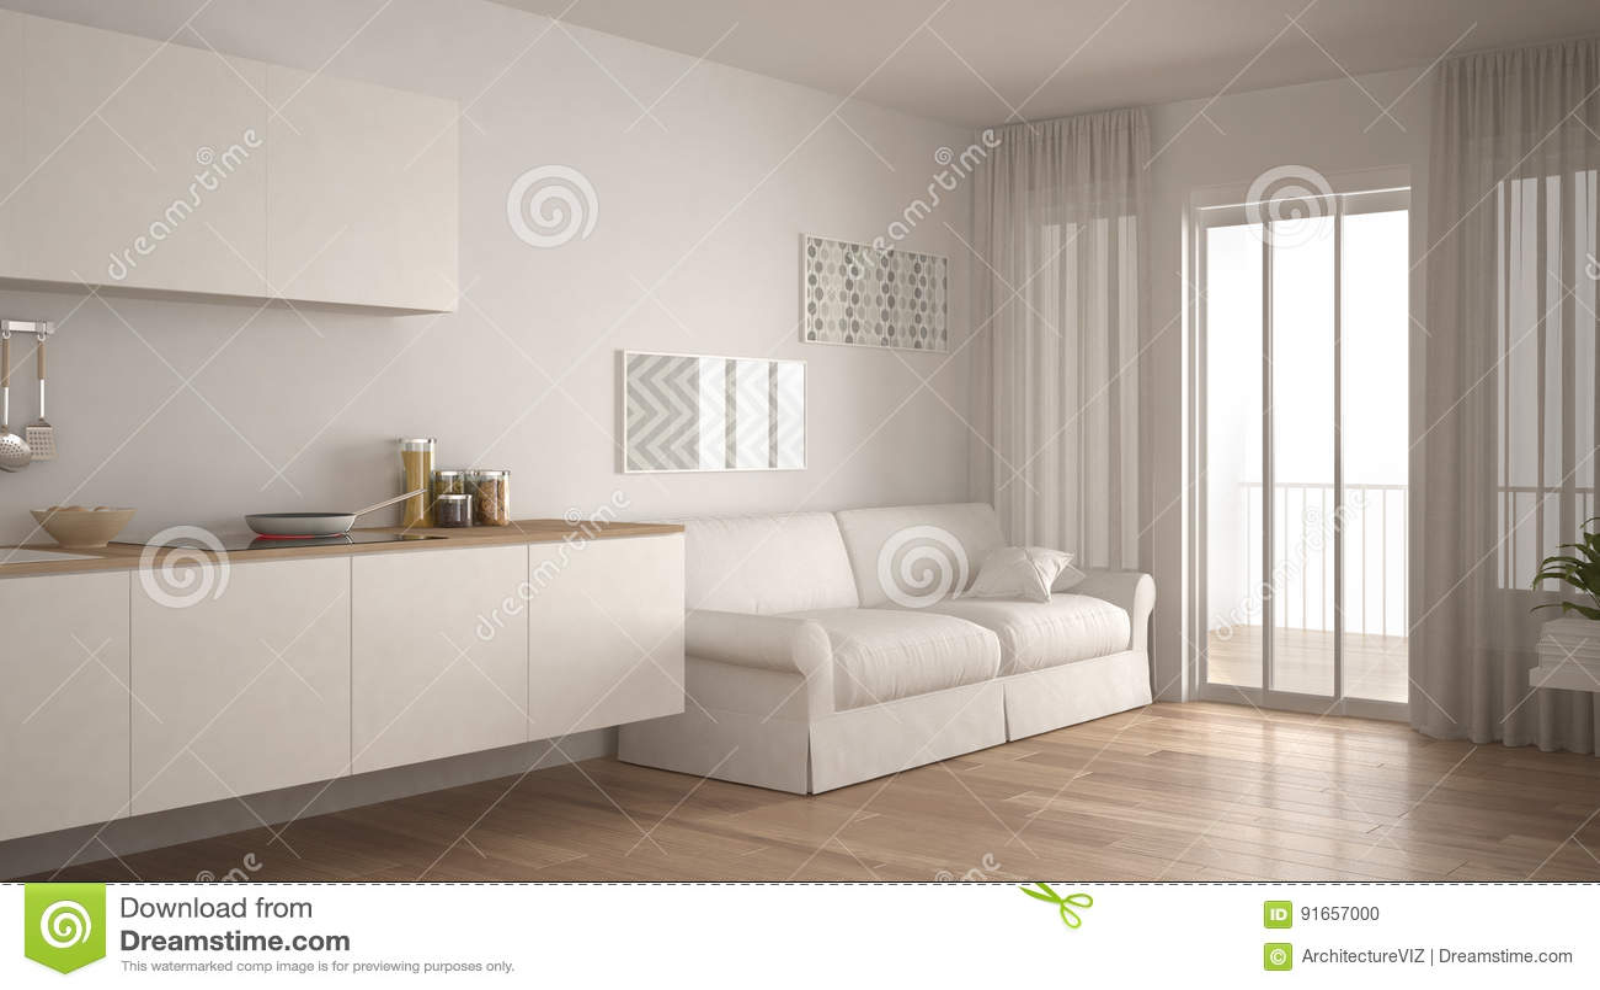 kitchen miniature metal shelves 有沙发的 木镶花地板 白色微型斯堪的纳维亚厨房库存例证 插画包括有 白色微型斯堪的纳维